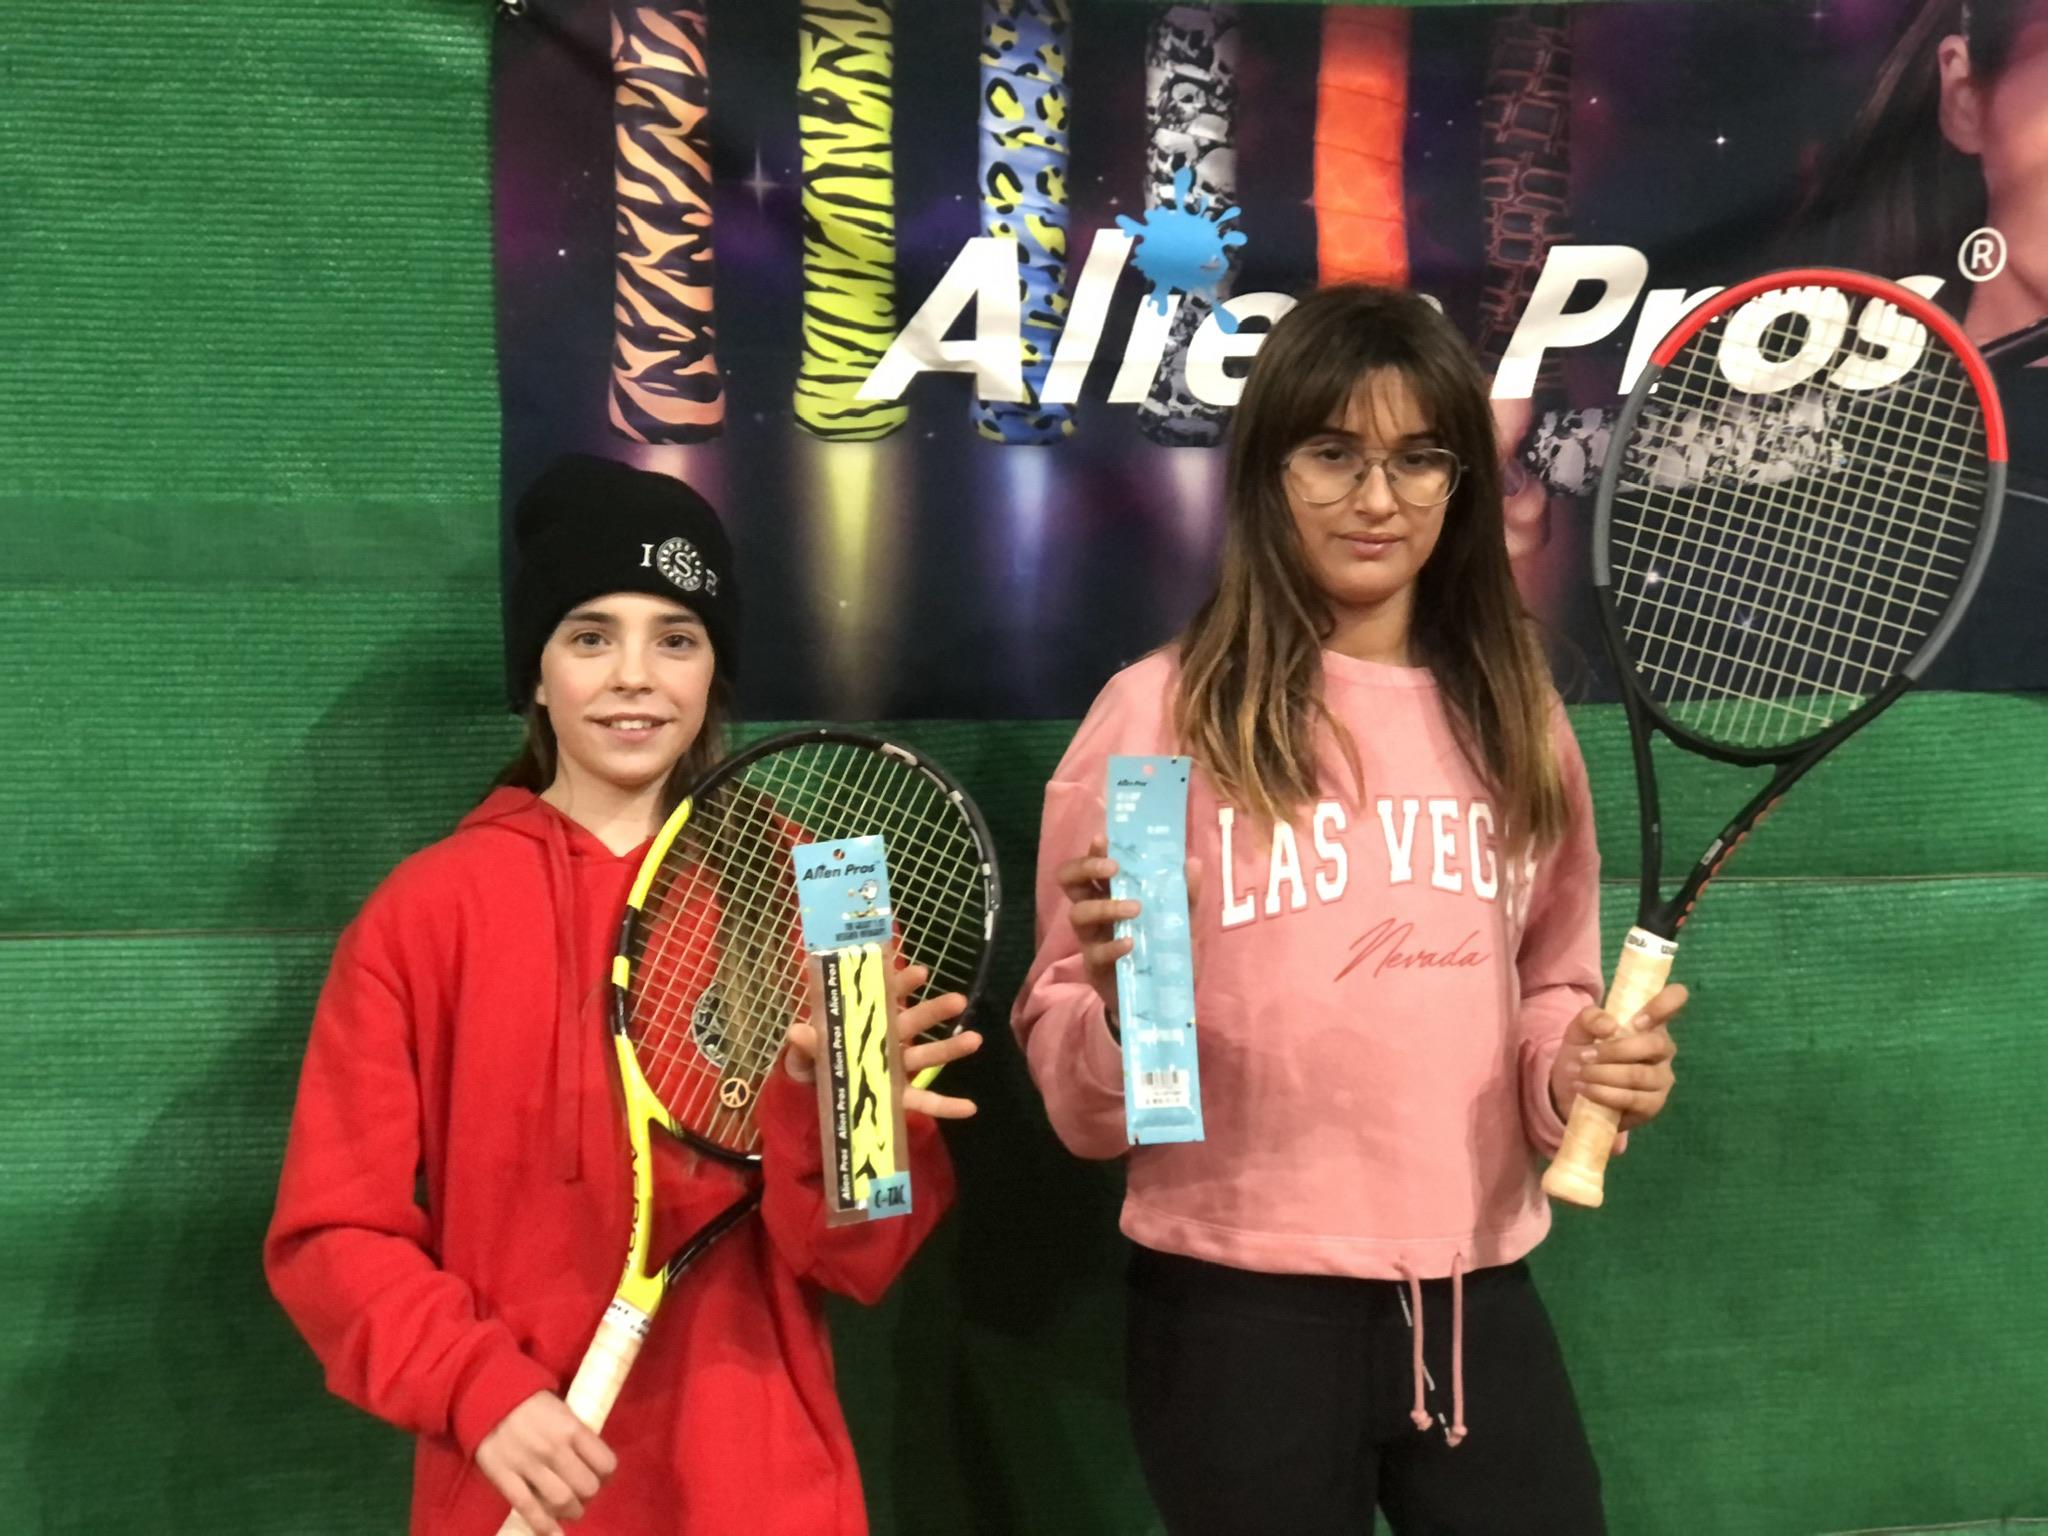 MBA-Tennis-Academy-Alien Pros Alumnos (4)